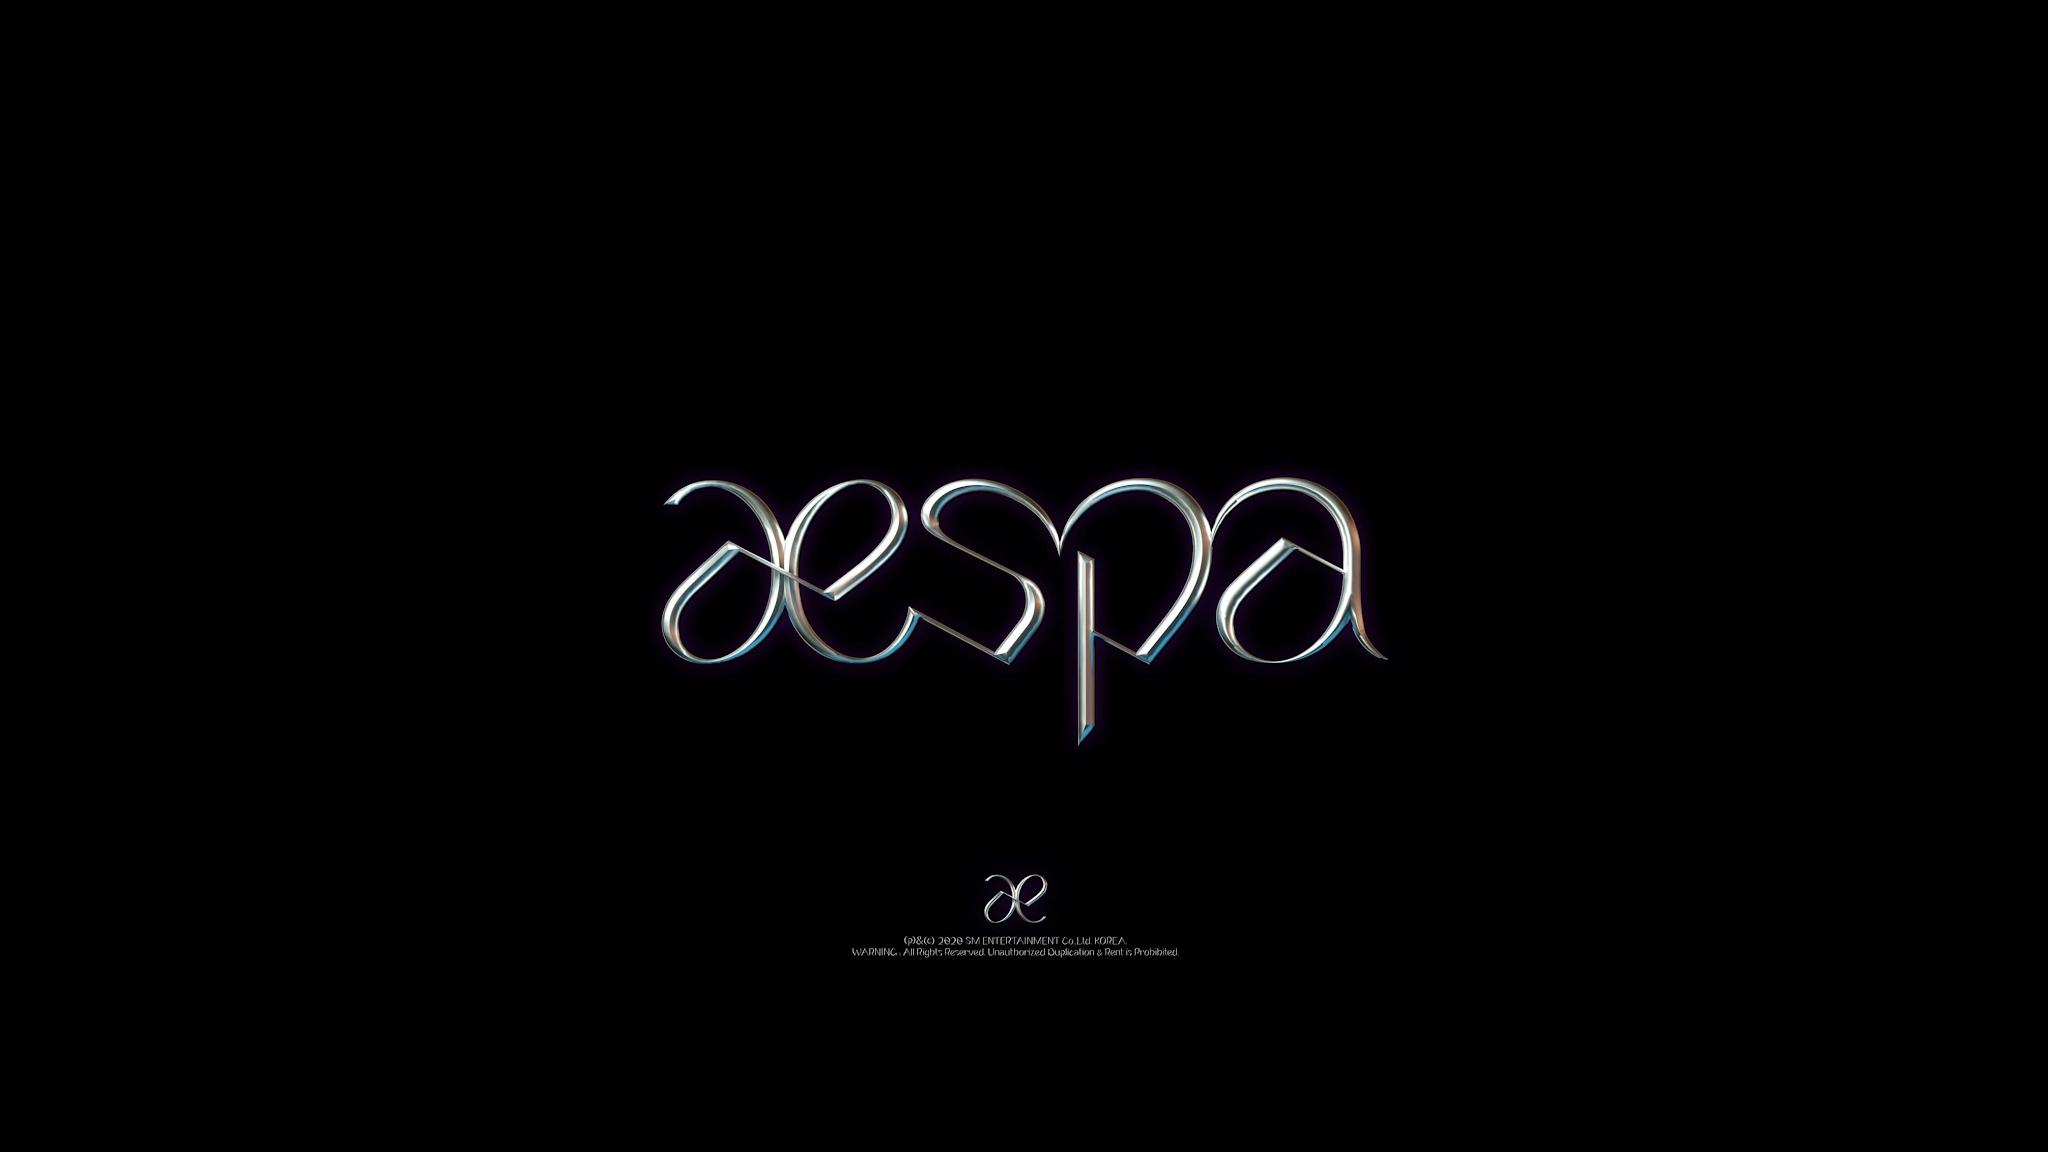 Named aespa, SM's New Girl Group Will Debut in November